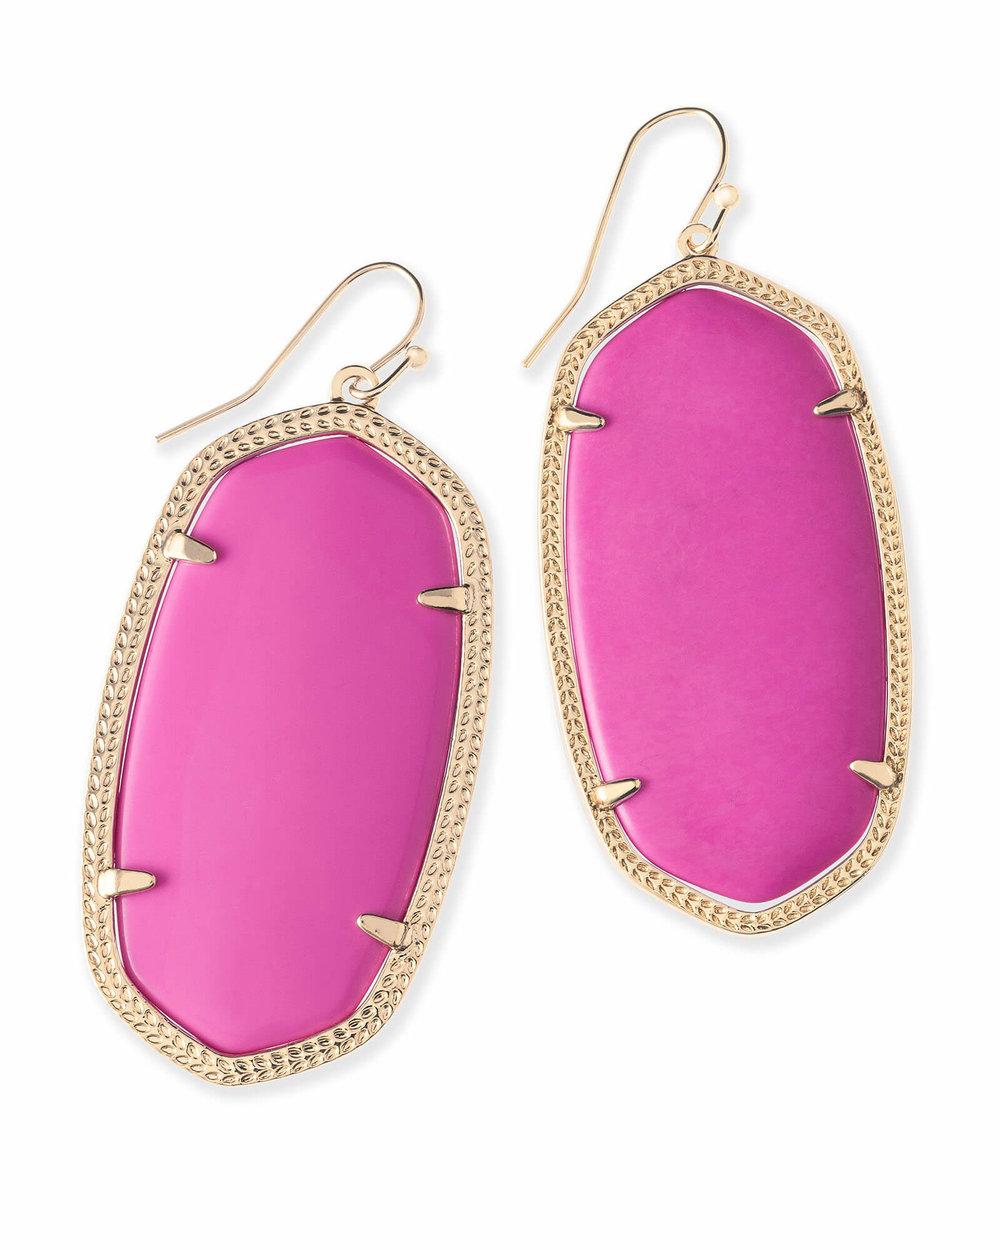 kendra-scott-danielle-gold-statement-earrings-in-magenta_00_default_lg.jpg